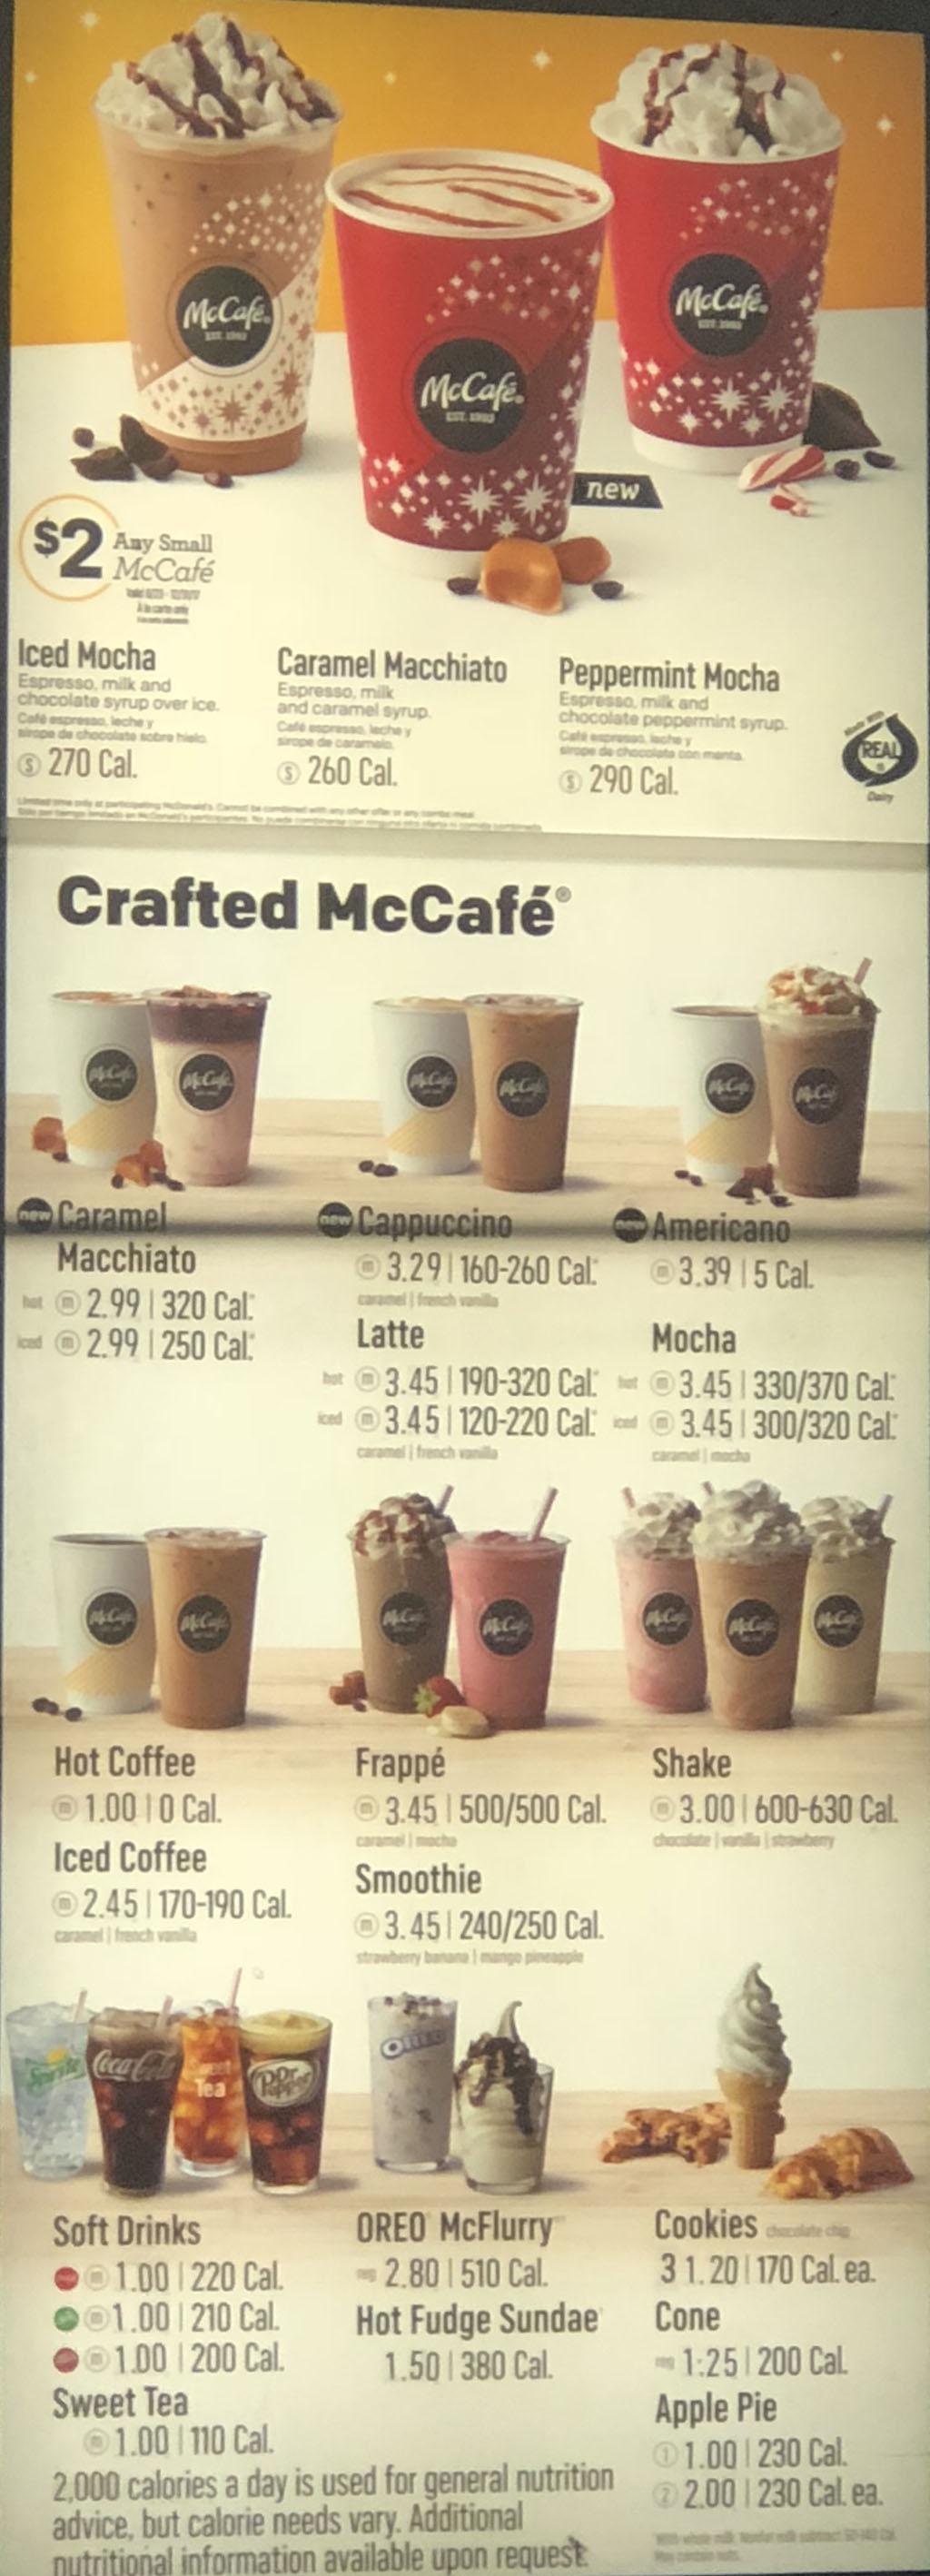 McDonalds menu - beverages